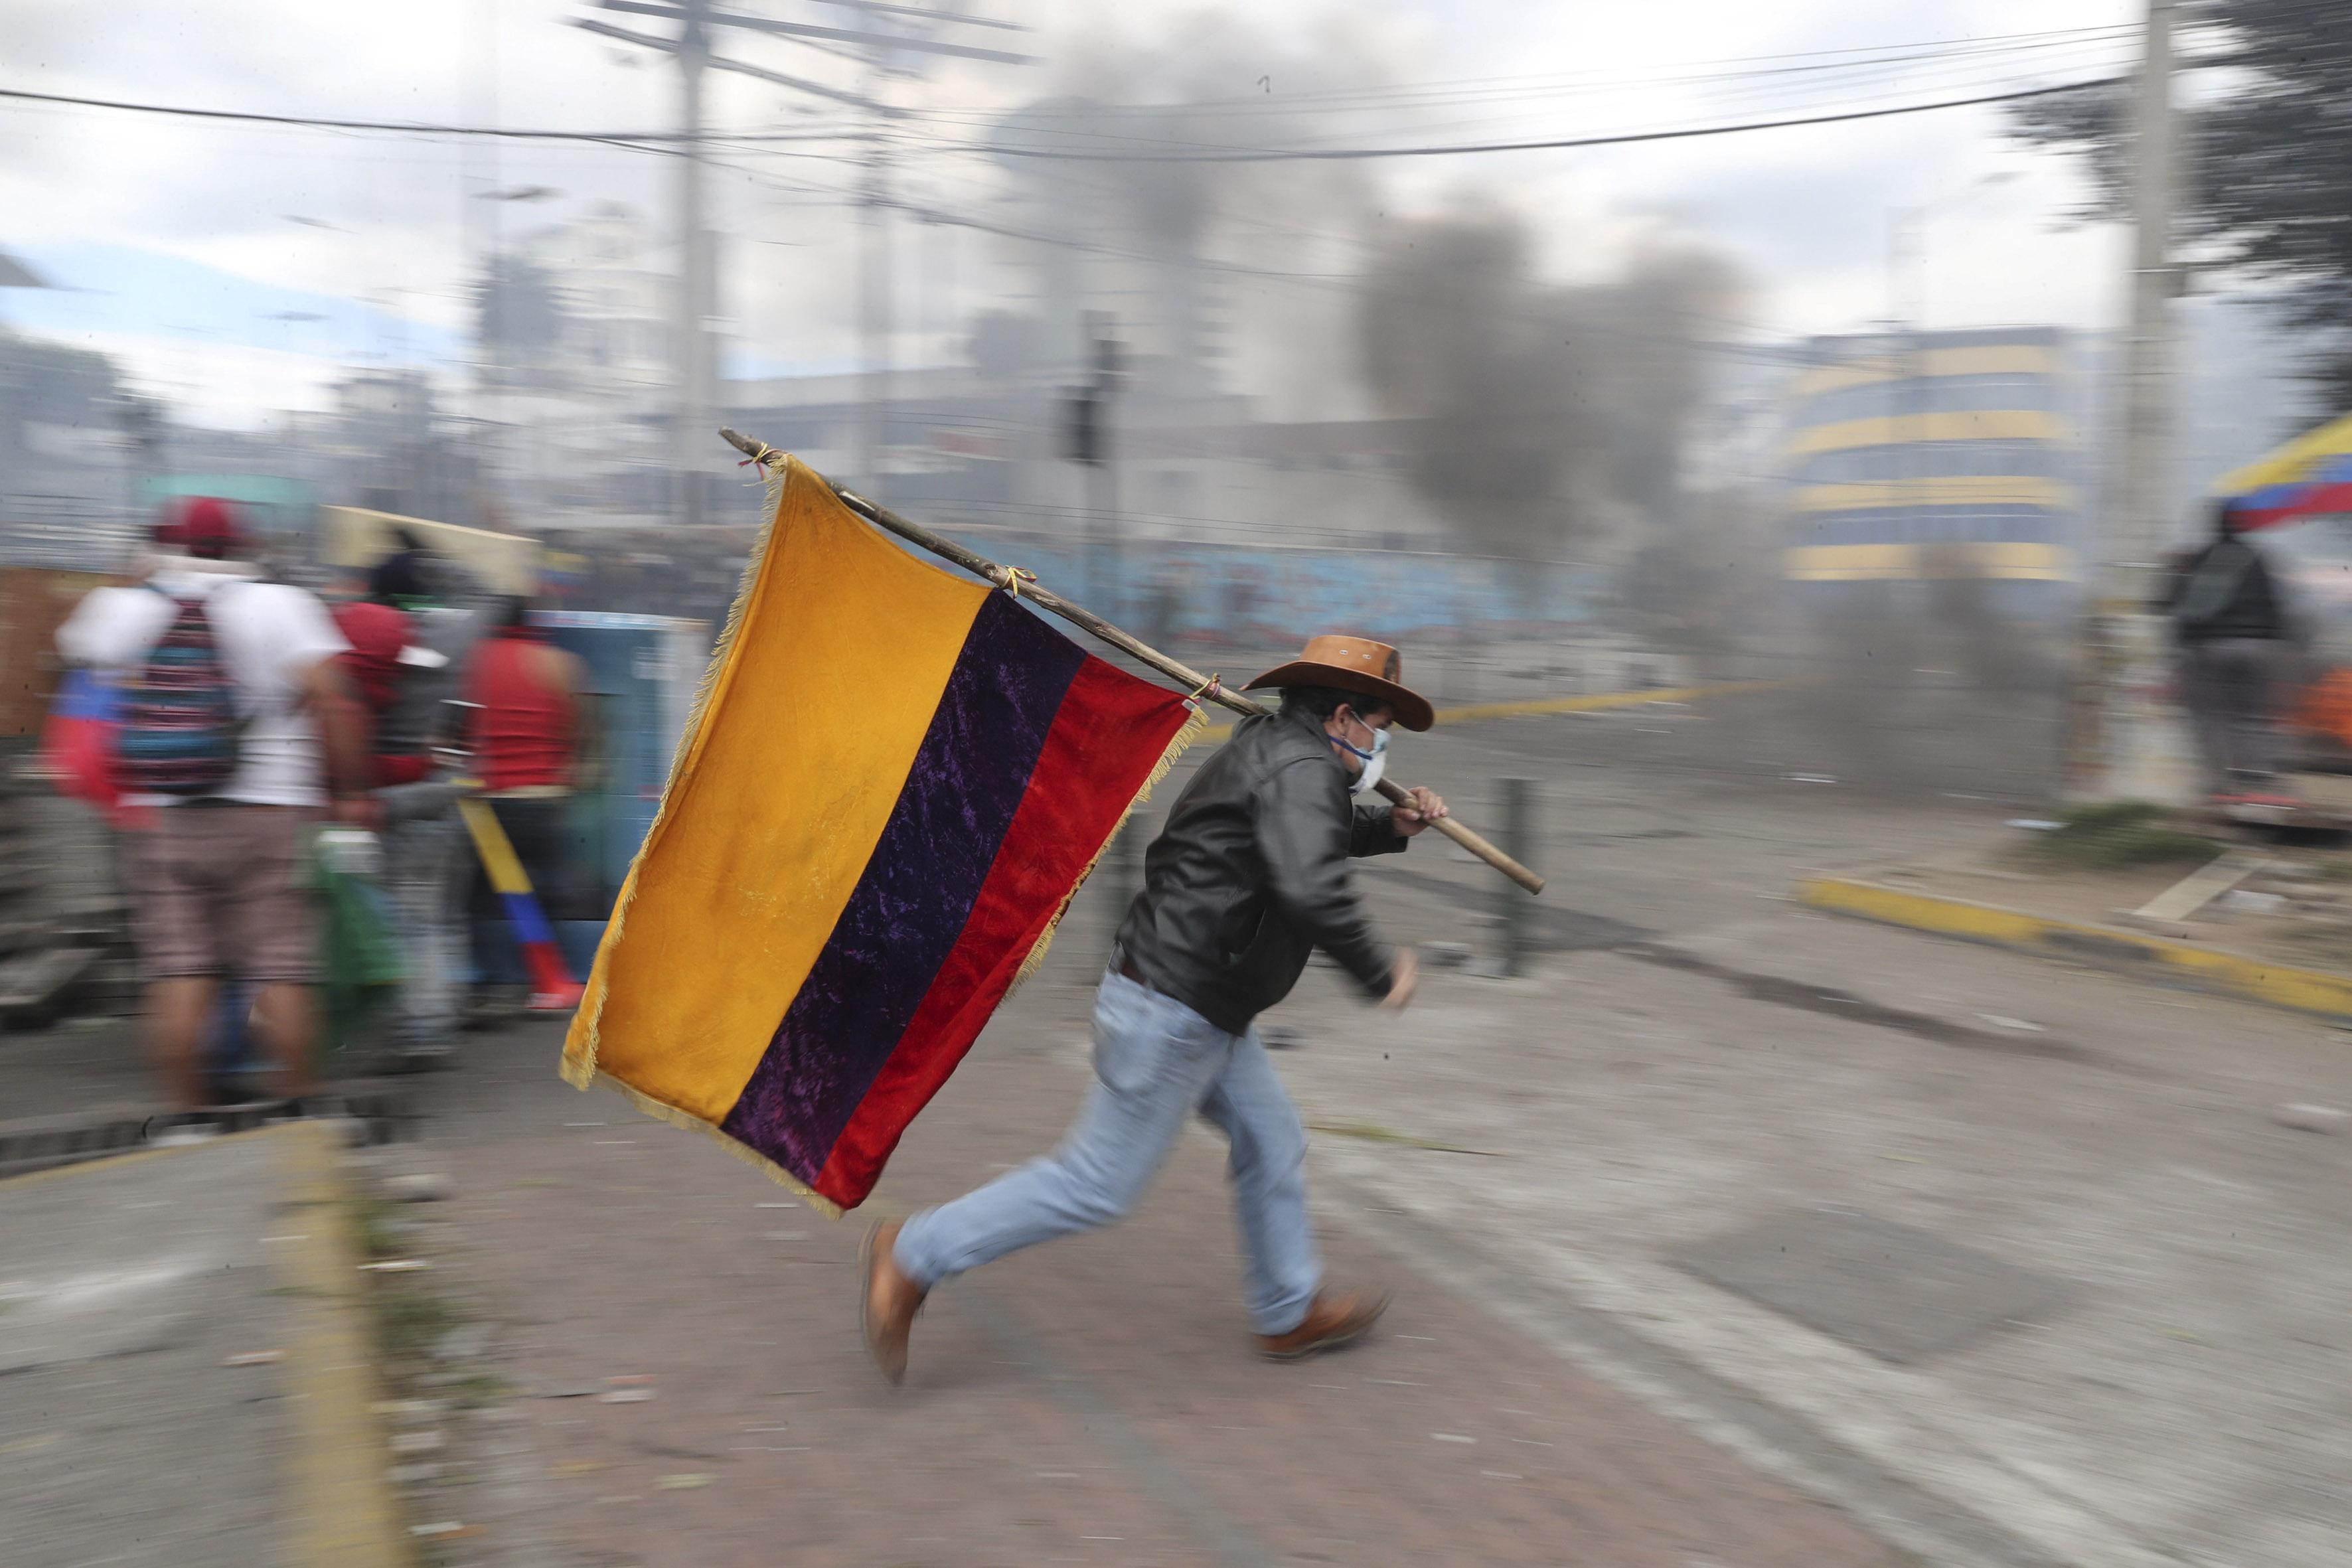 12 October 2019: A demonstrator running while holding an Ecuadorian flag in Quito, Ecuador, during a protest against President Lenín Moreno's austerity measures. (Photographs by Reuters/Ivan Alvarado)